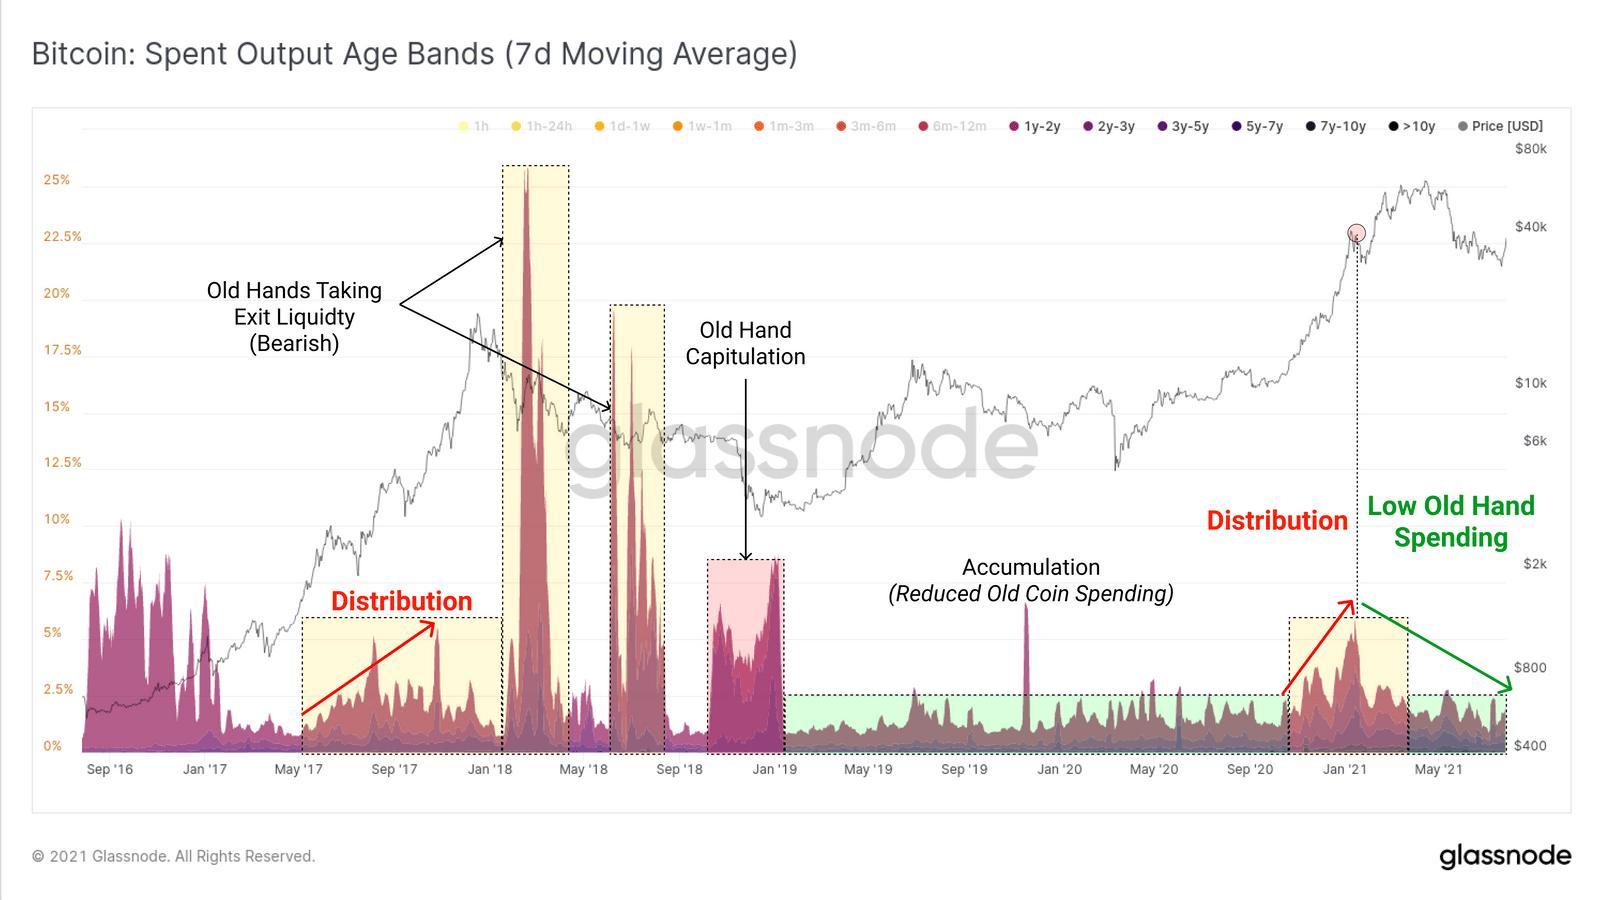 Spent Output Age Bands für Bitcoin